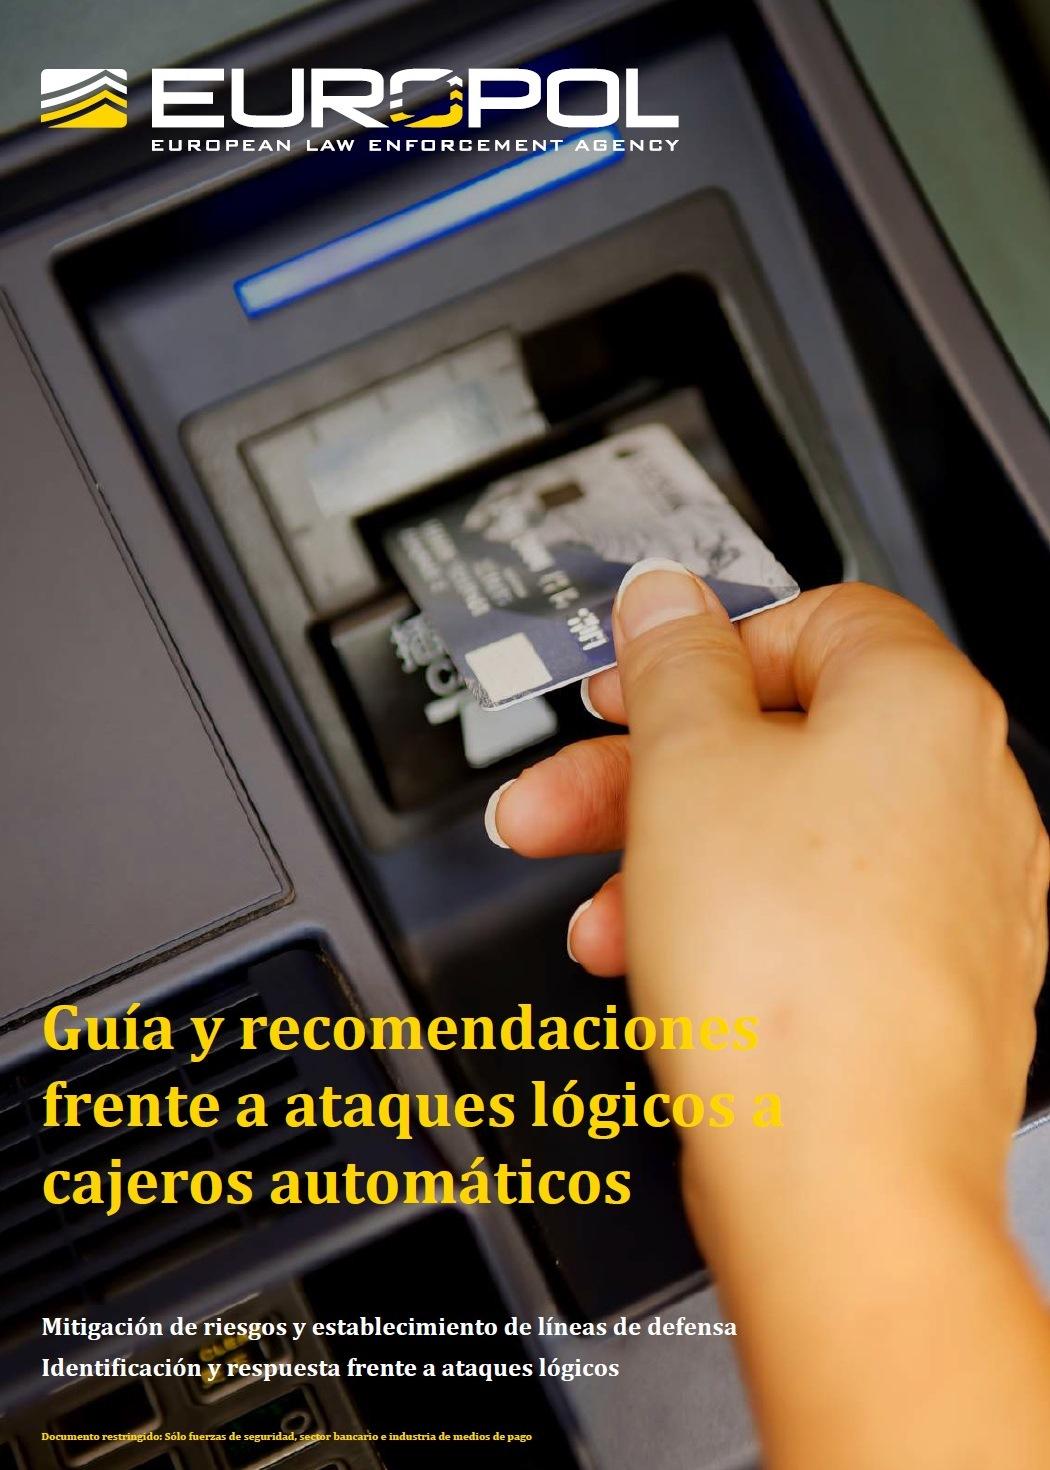 ATM Malware Guidelines - Spanish